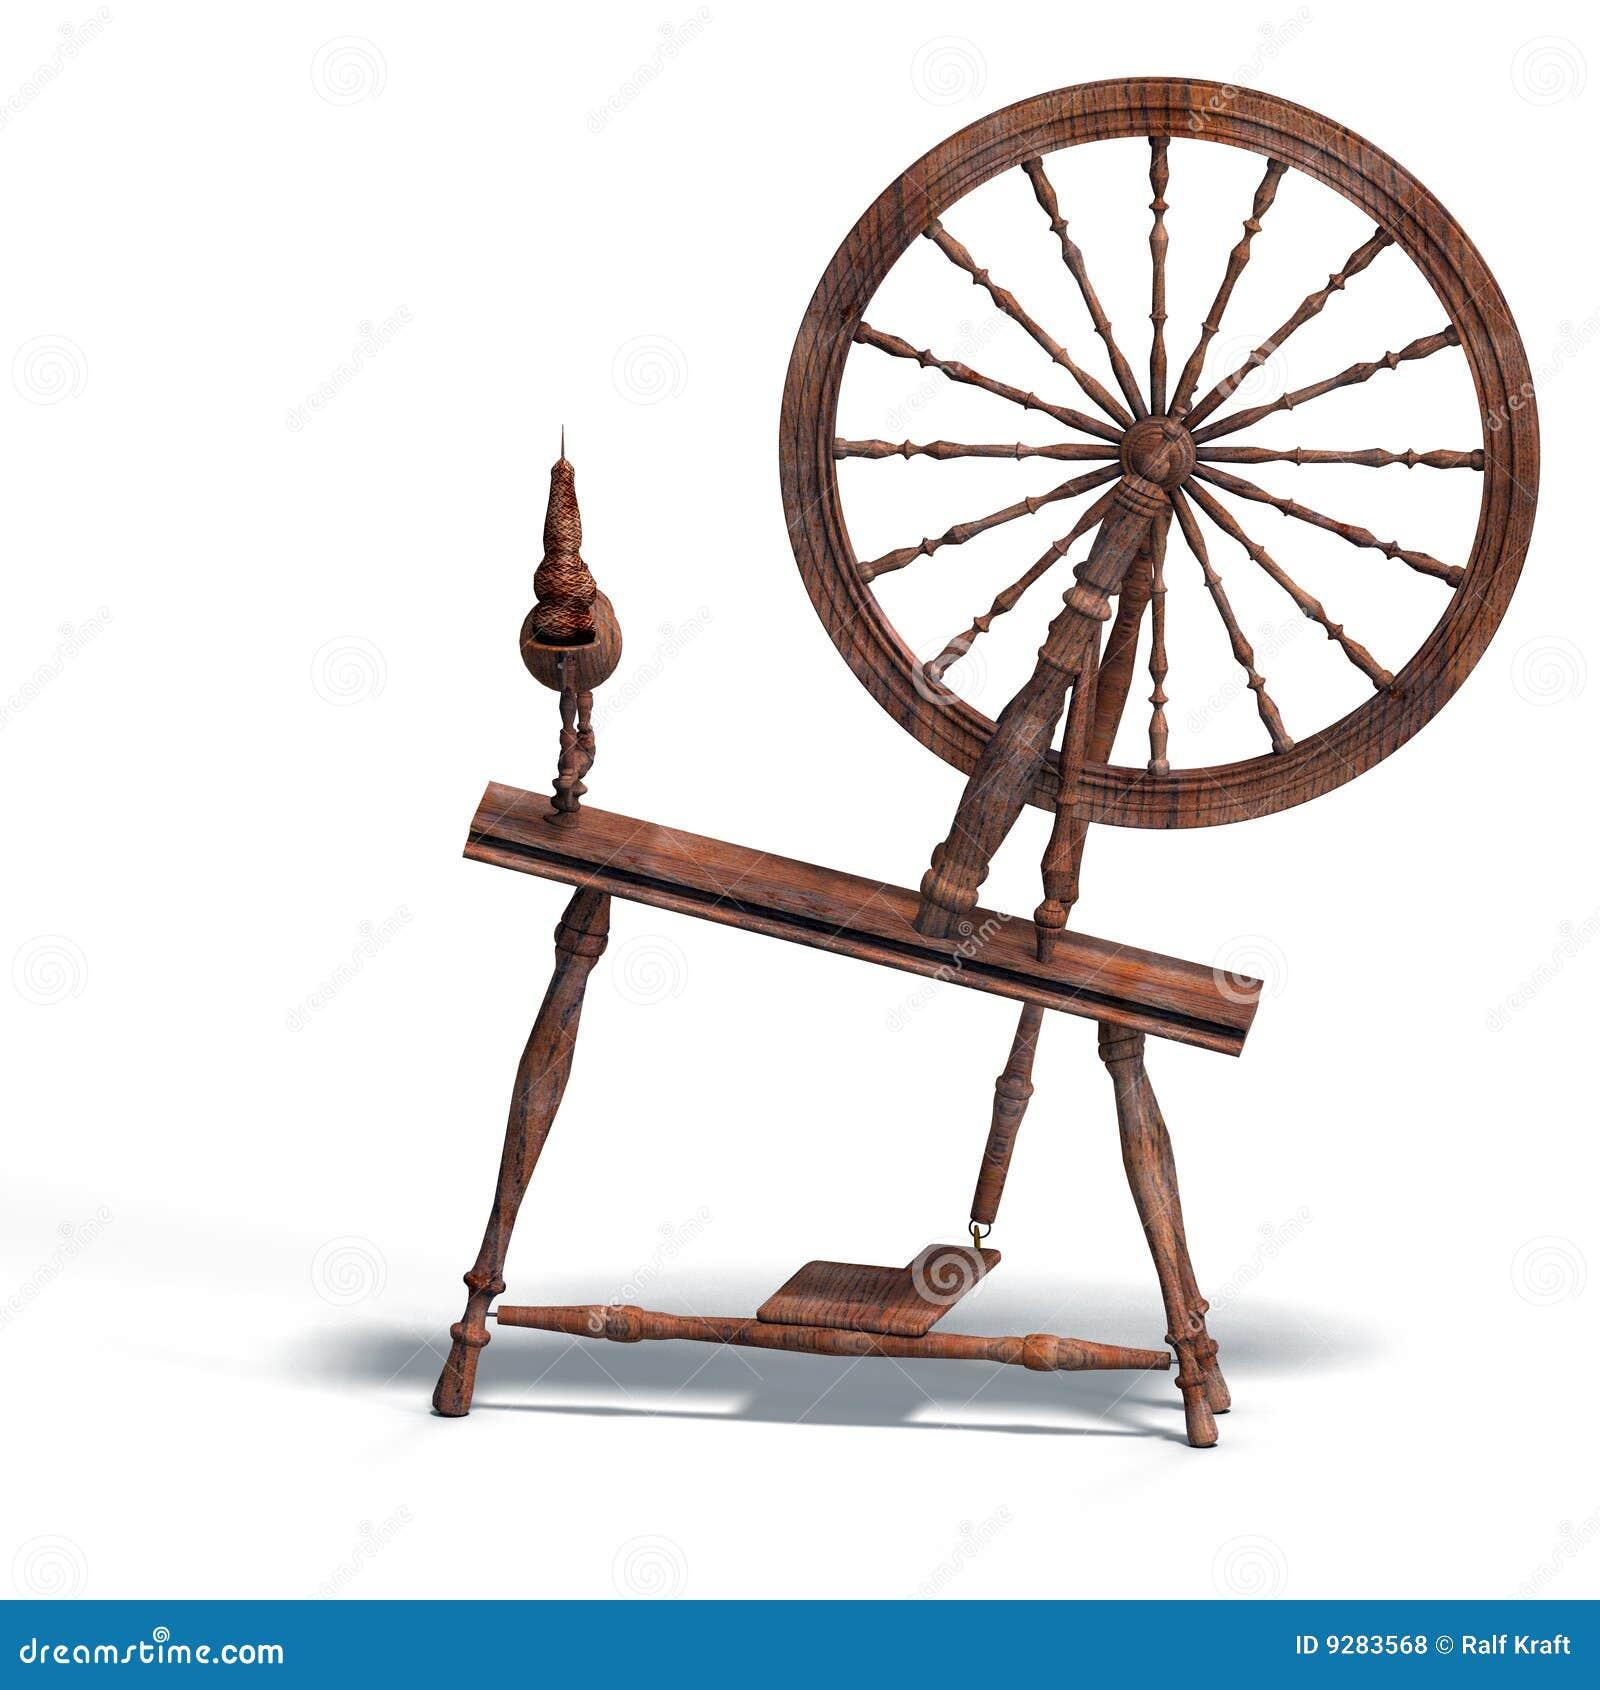 Spinning Wheel Royalty Free Stock Photos Image 9283568